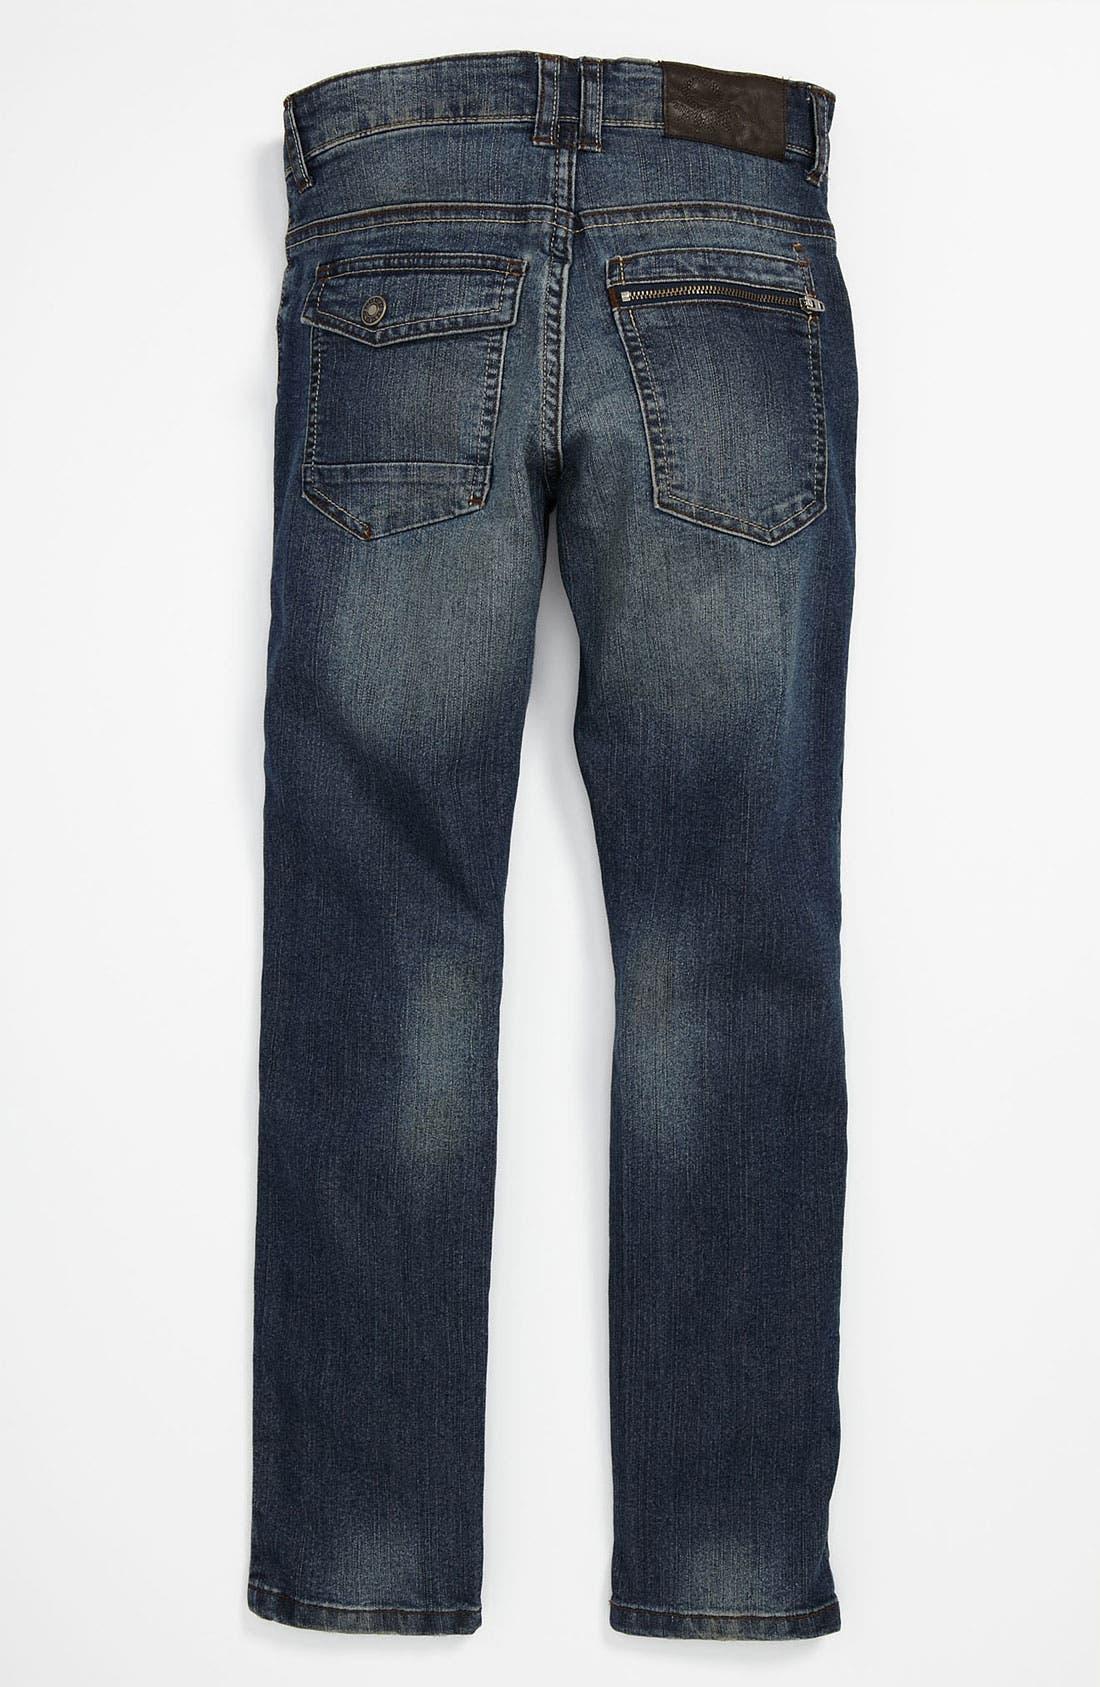 Alternate Image 1 Selected - United Colors of Benetton Kids Skinny Leg Jeans (Little Boys & Big Boys)